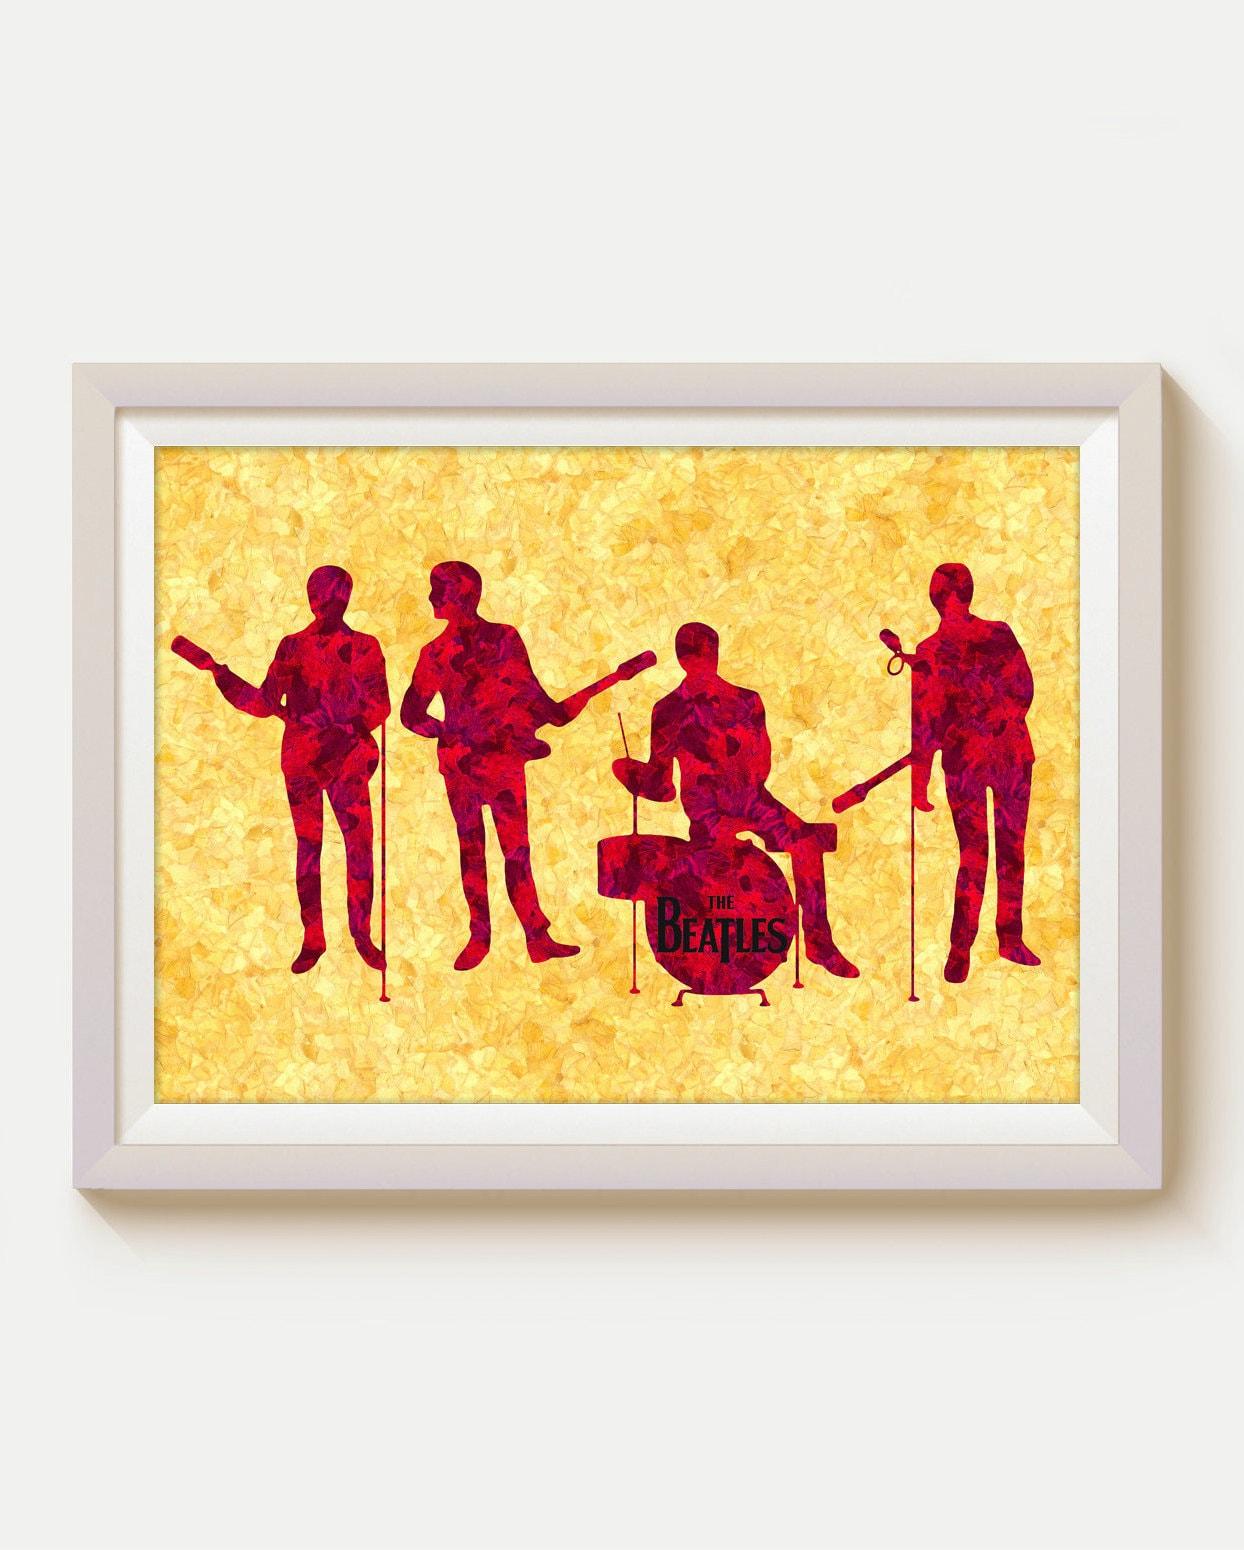 Beatles John Lennon Paul McCartney Beatles Print Rock Music